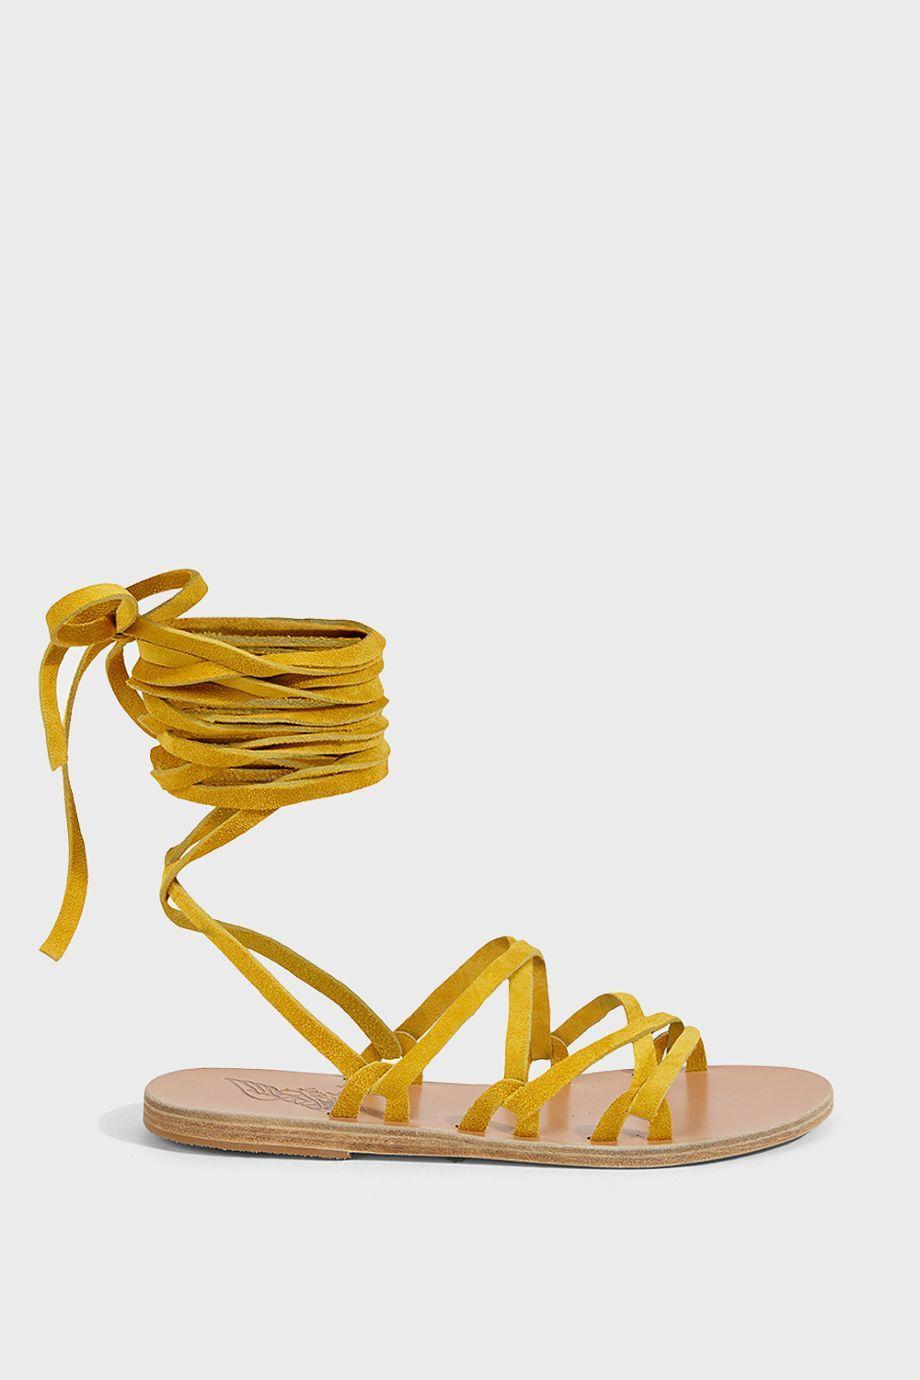 c9cf0f5b0f69 Ancient Greek Sandals Simply Kariatida Rope Sandals In Yellow